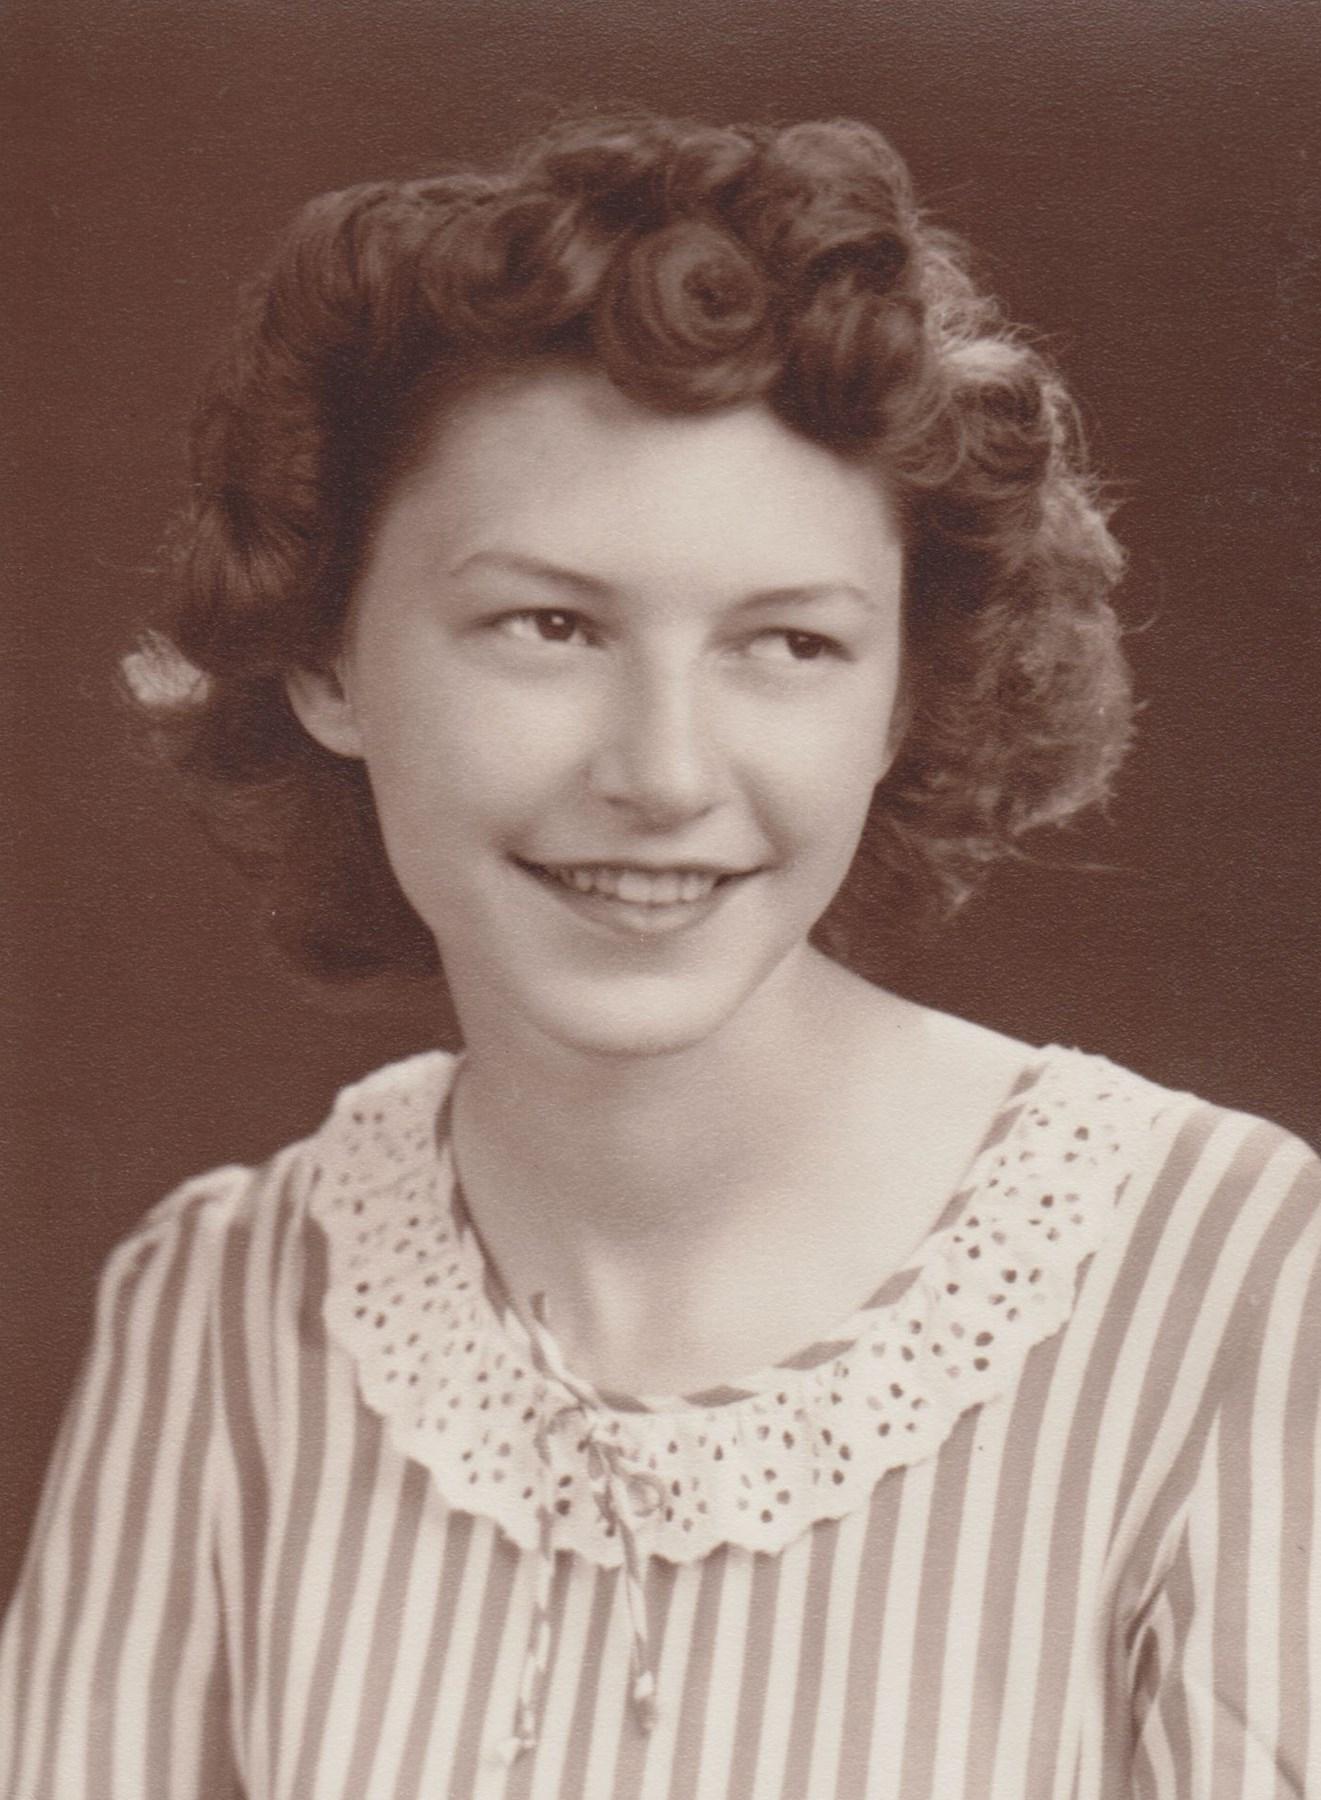 Pippa Grandison Adult pic Liu Yifei,Judy Parfitt (born 1935)